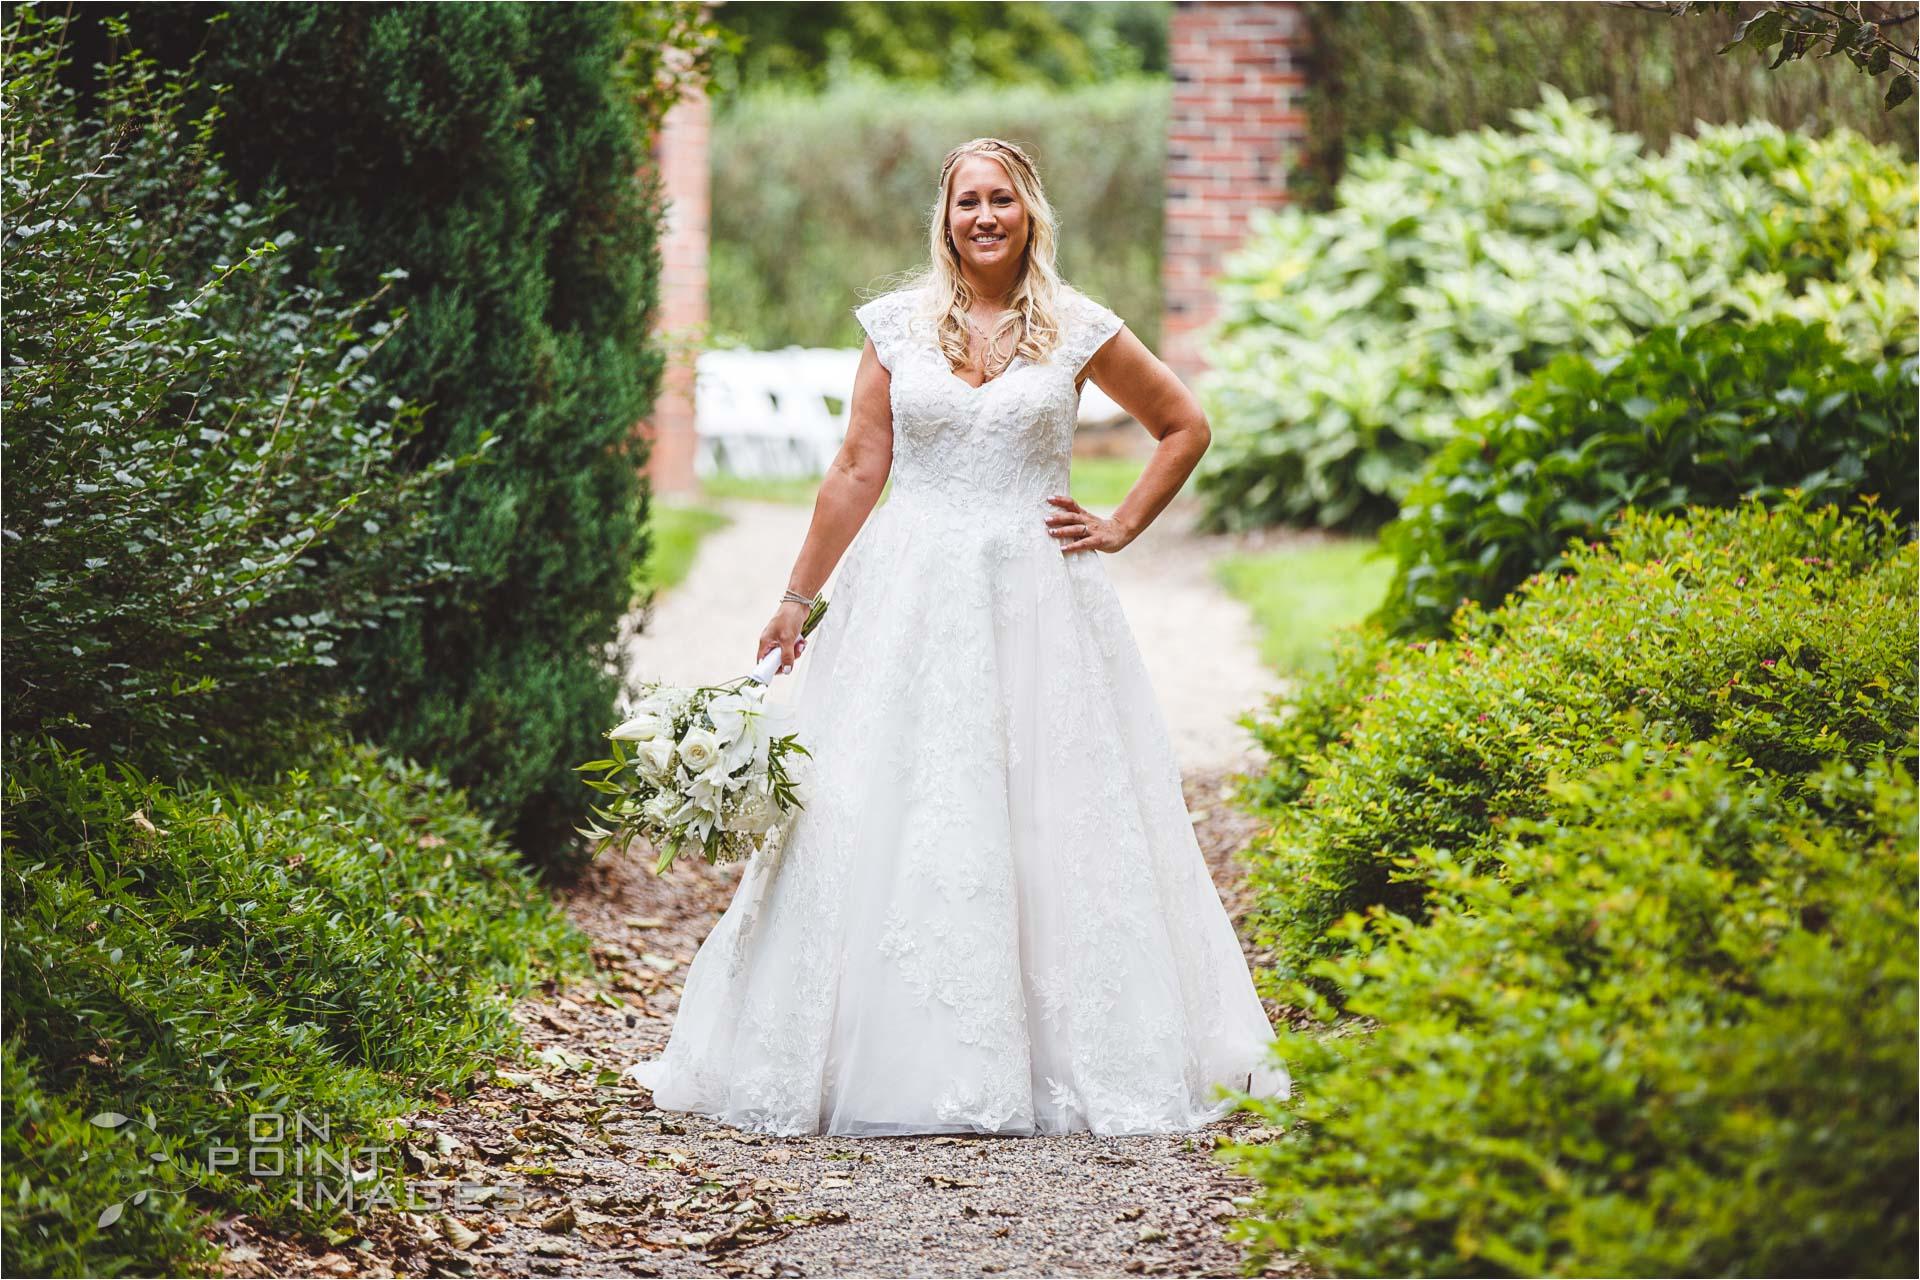 Wickham-Park-English-Garden-Wedding-Images-16.jpg